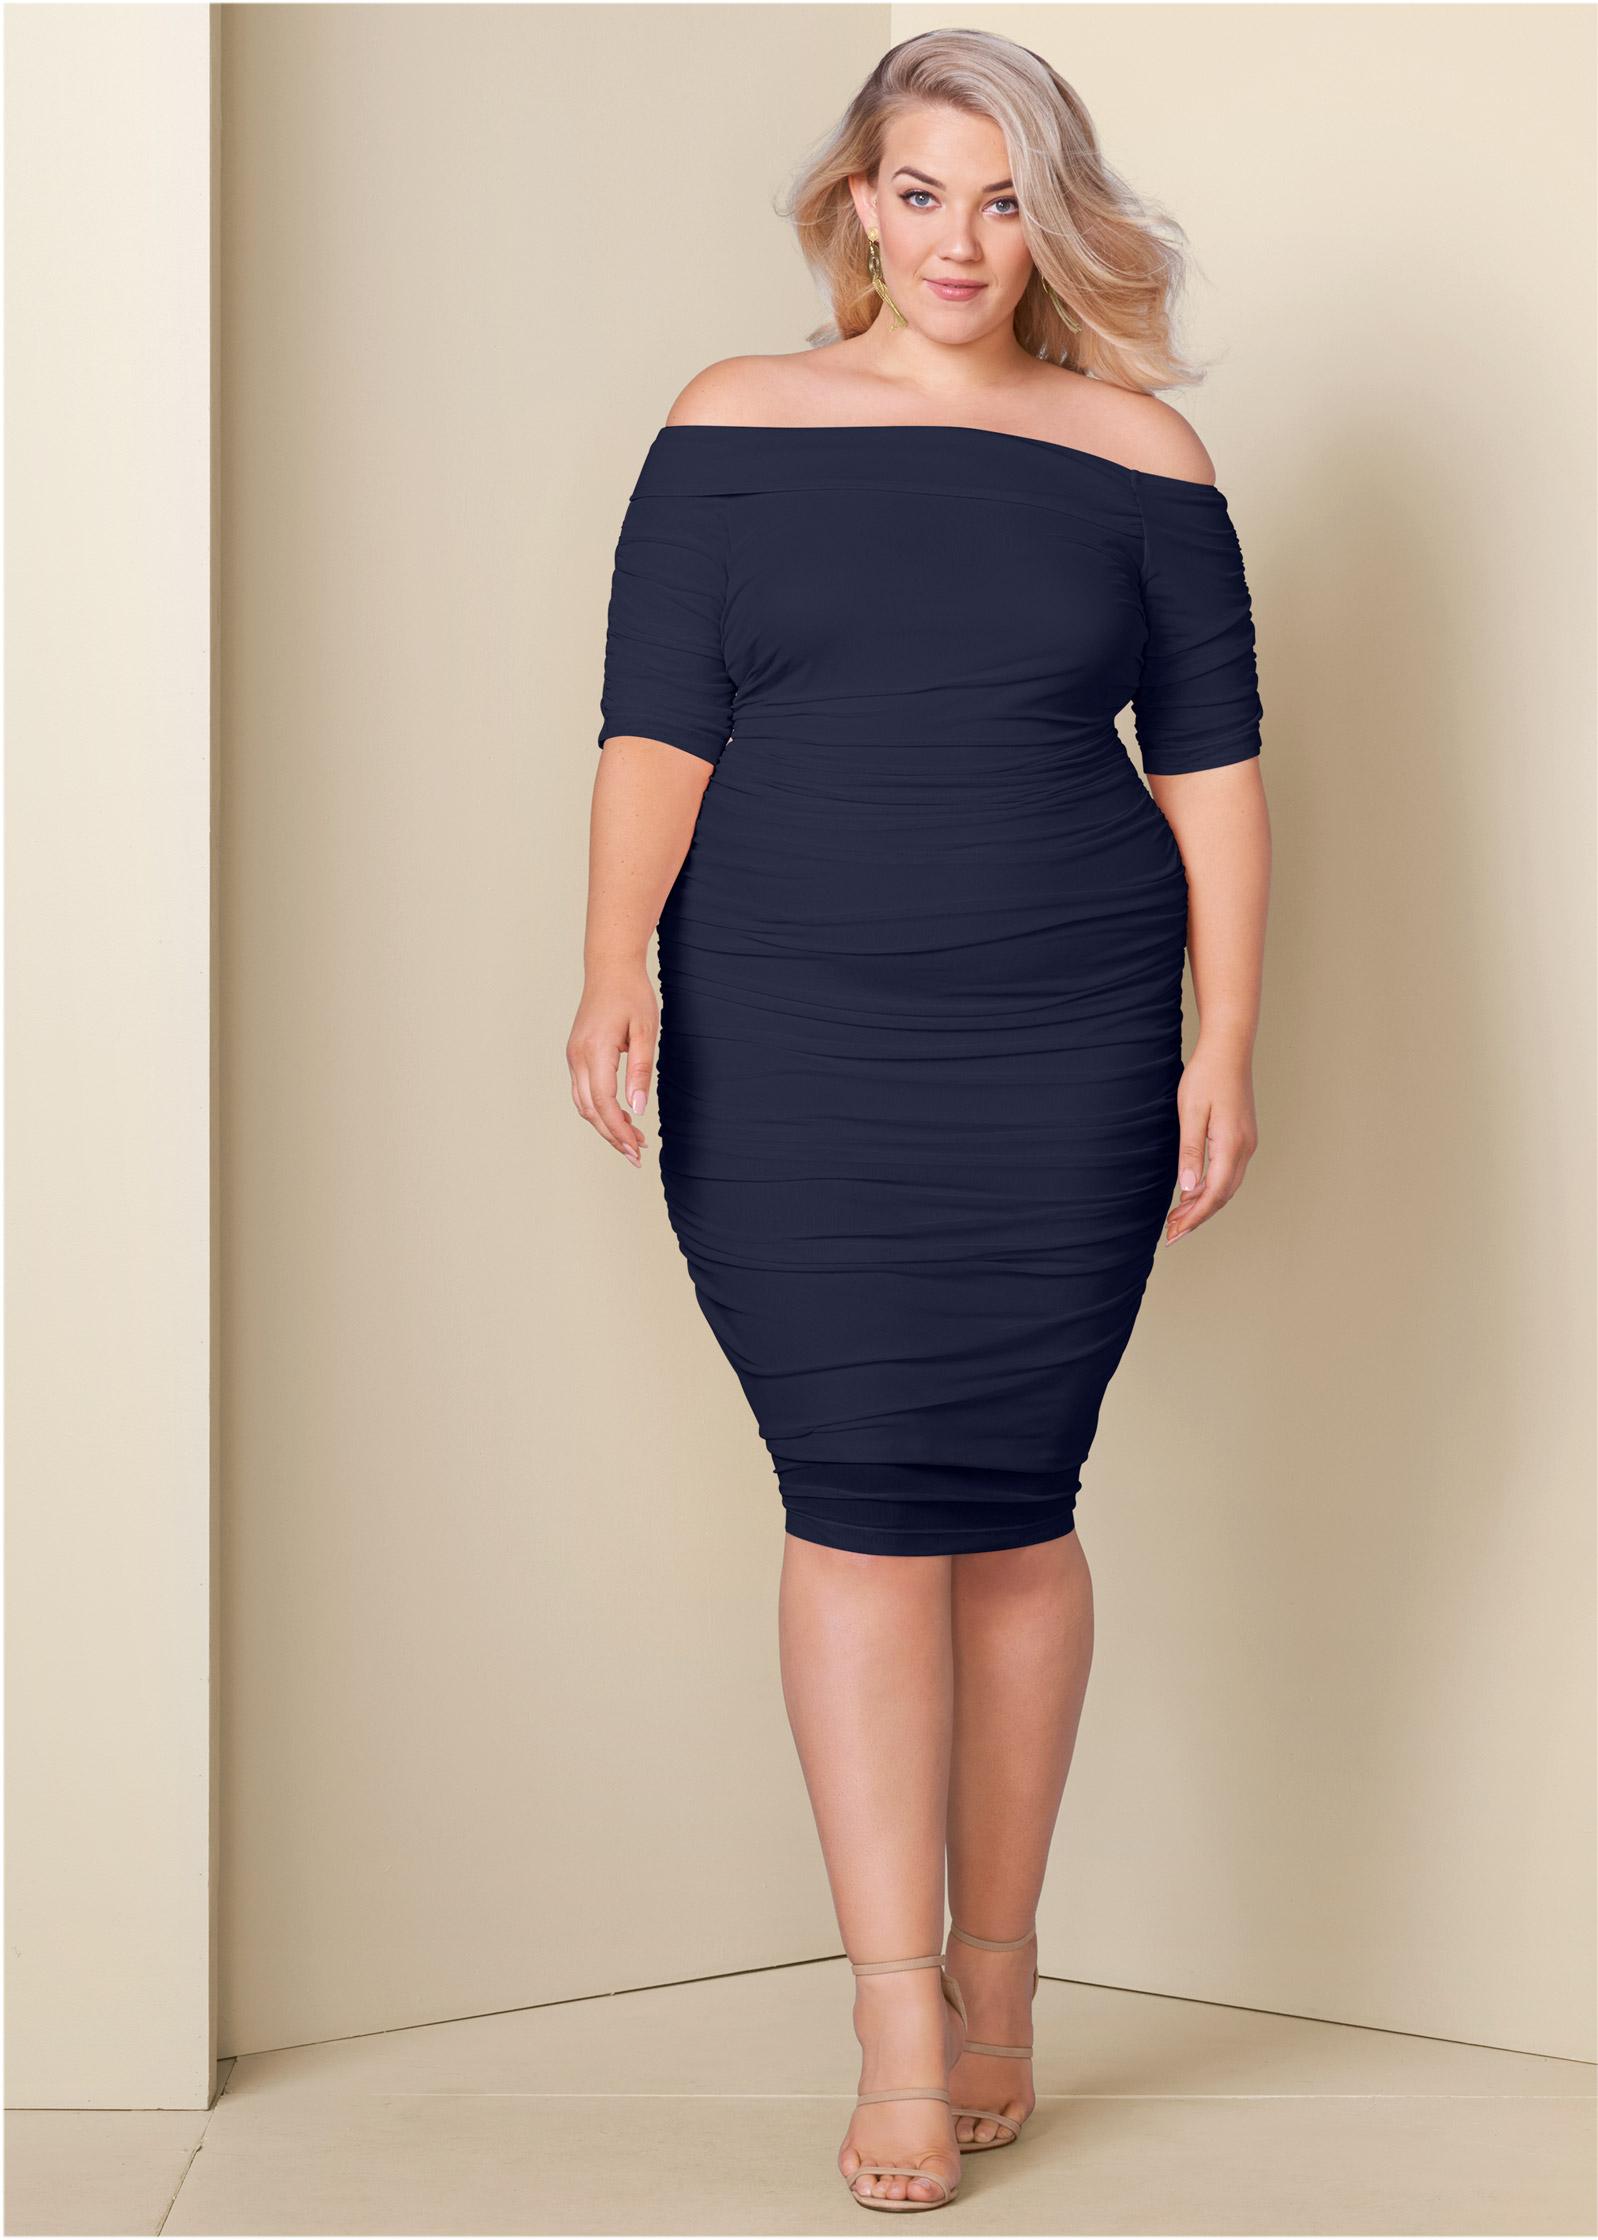 Designer Plus Size Cocktail Dresses for Women